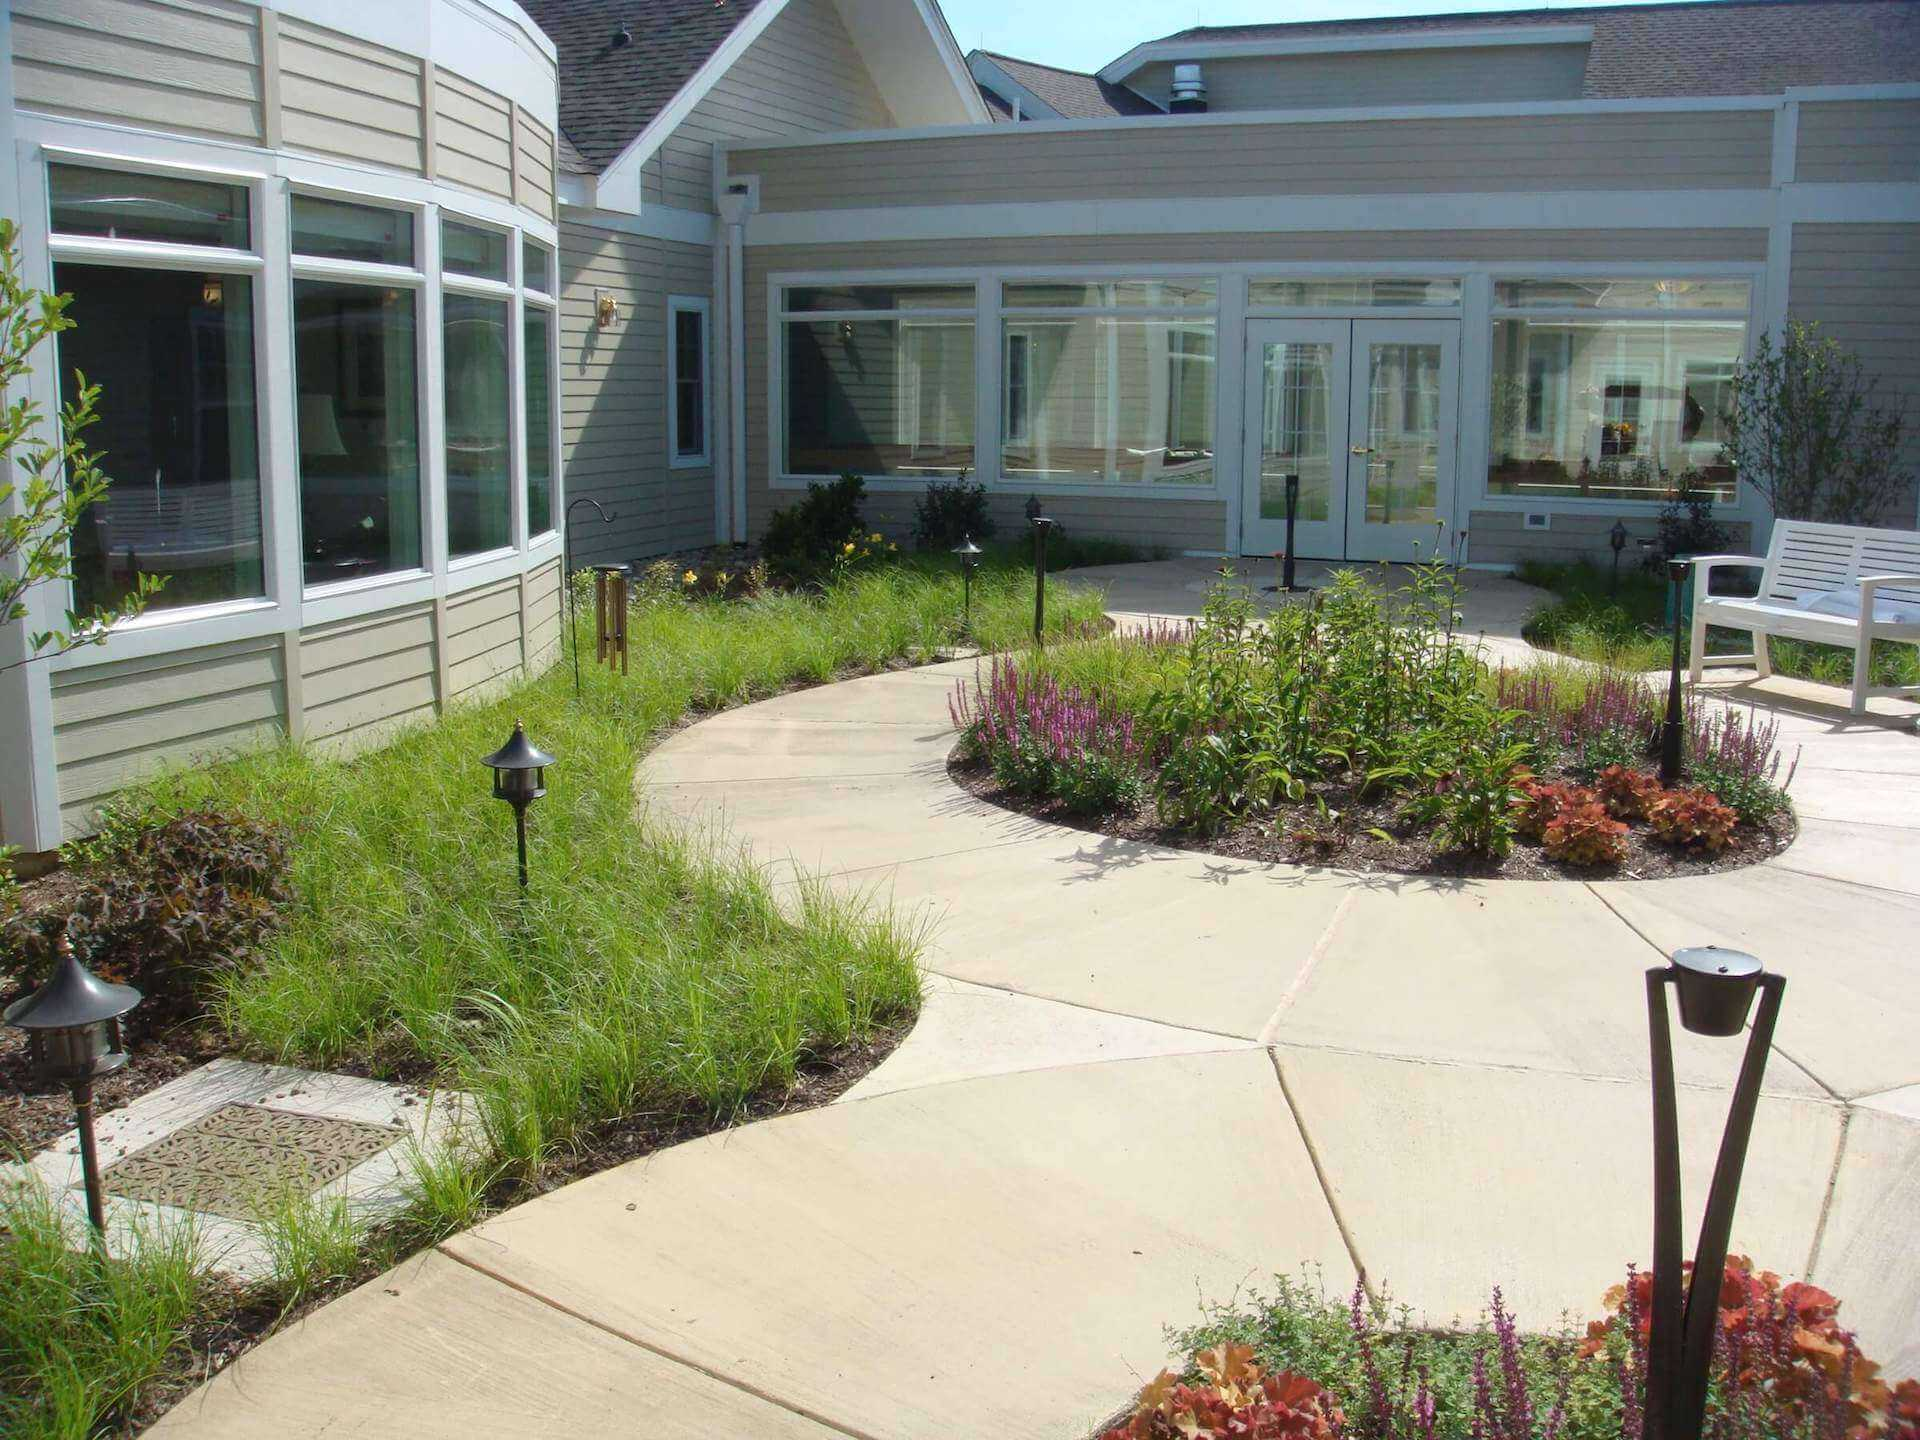 Somerford Place Institution catharine ann farnen landscape architecting